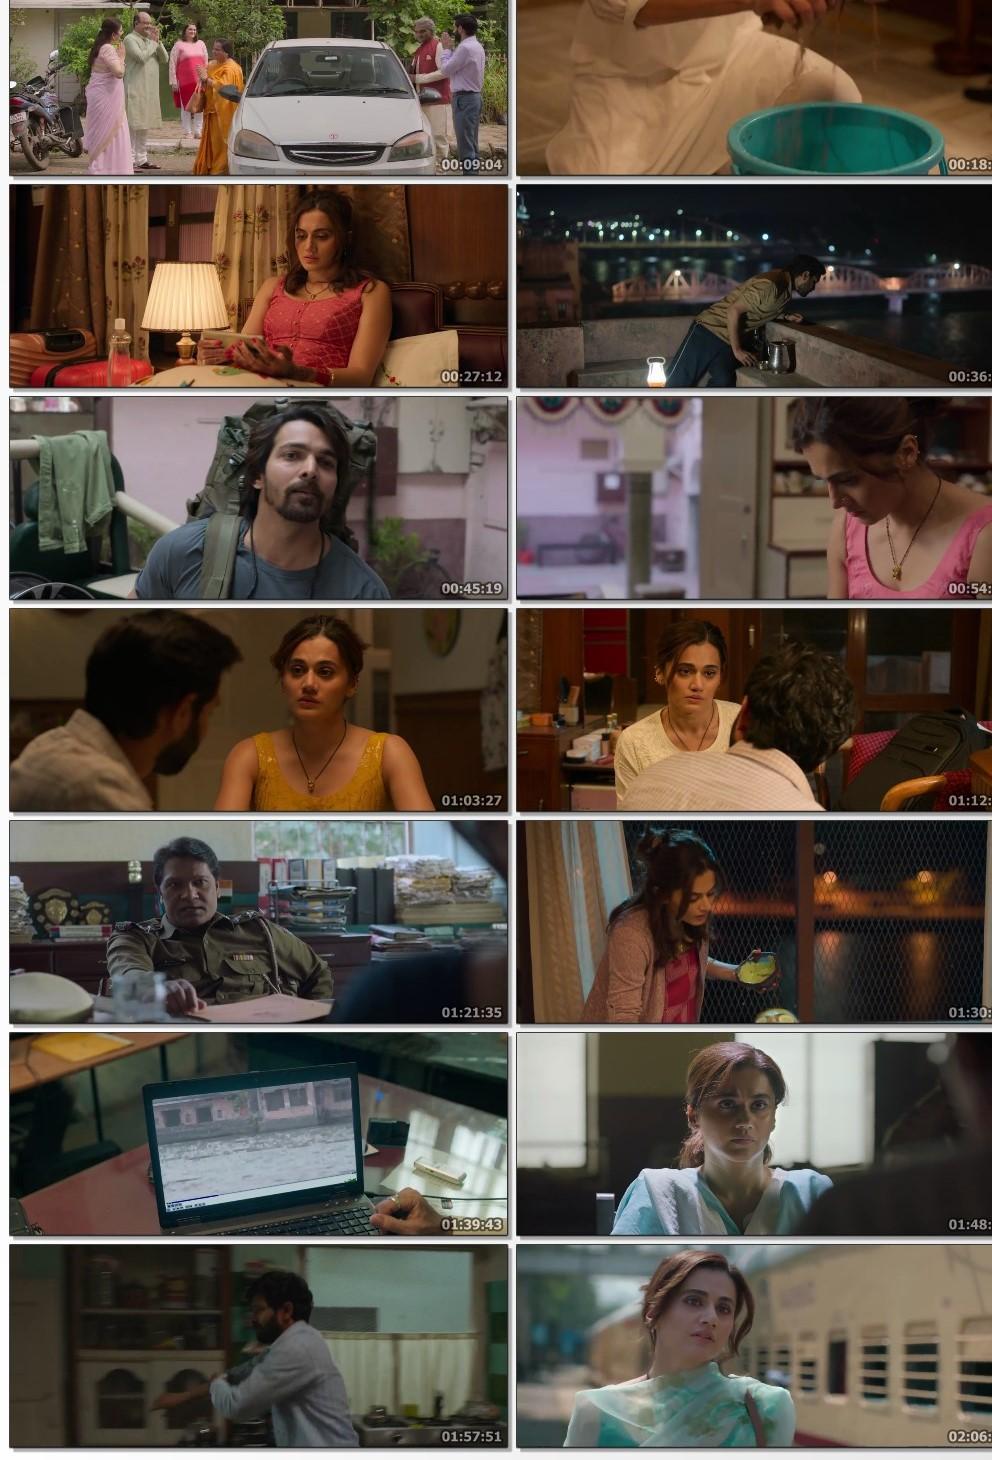 Haseen-Dillruba-2021-Hindi-Movie-720p-NF-HDRip-MSub-900-MB-mkv-thumbsdc79d9f7579f982a